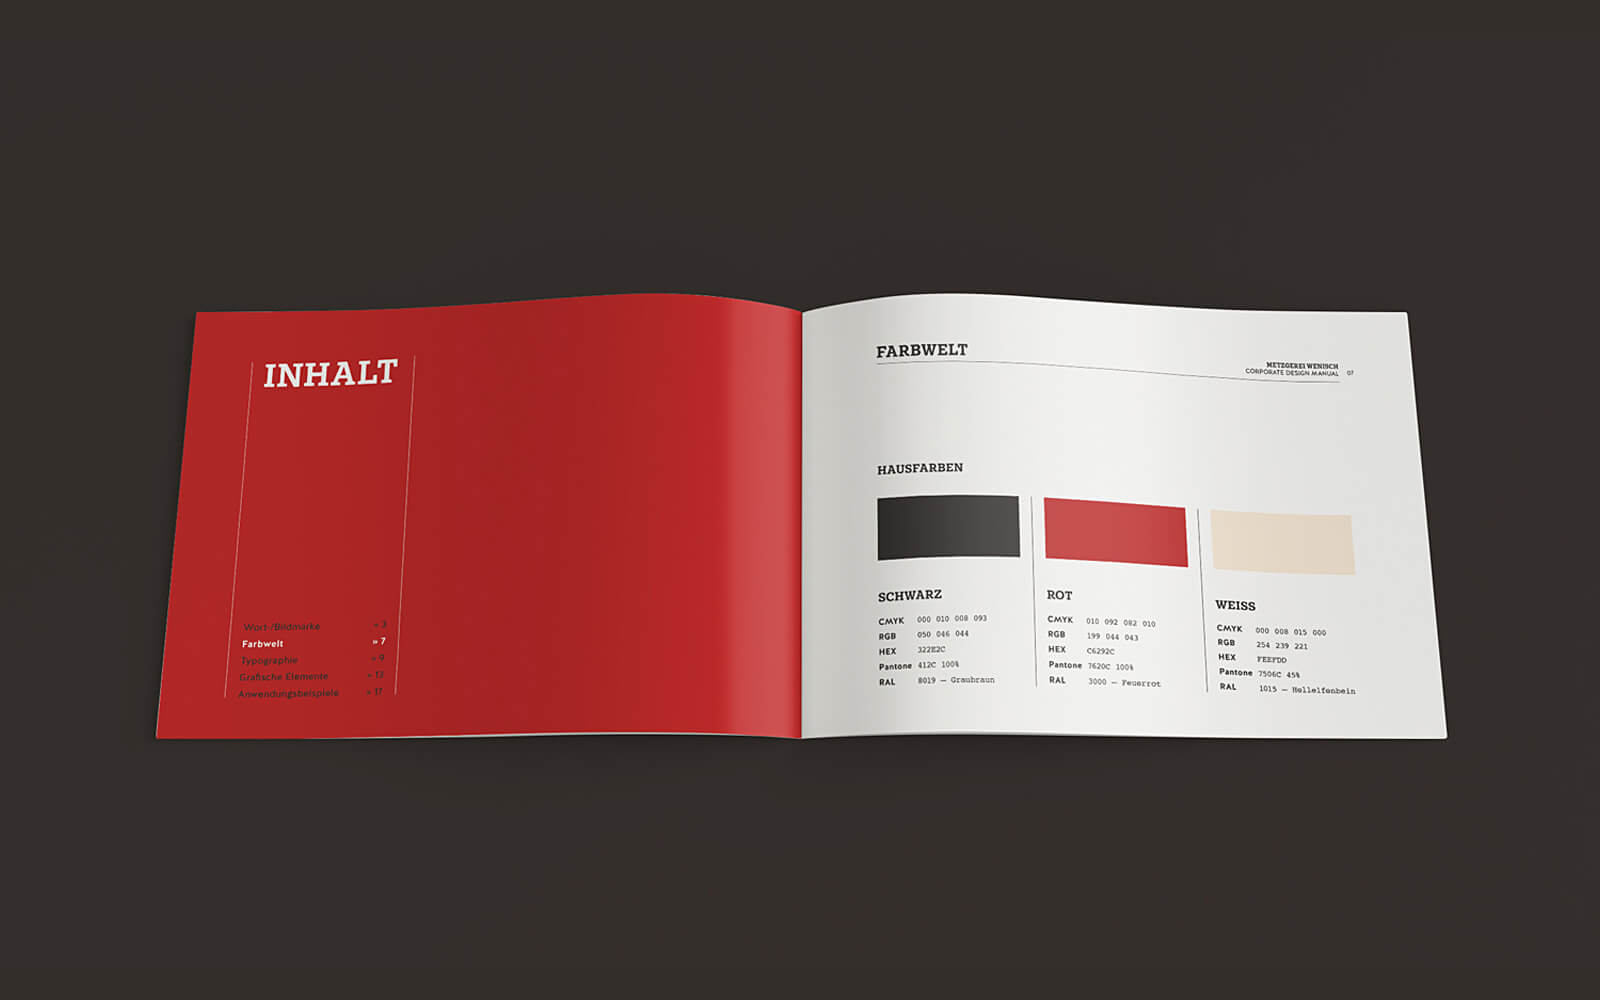 Auszug aus dem Corporate Design Manual der Metzgerei Wenisch